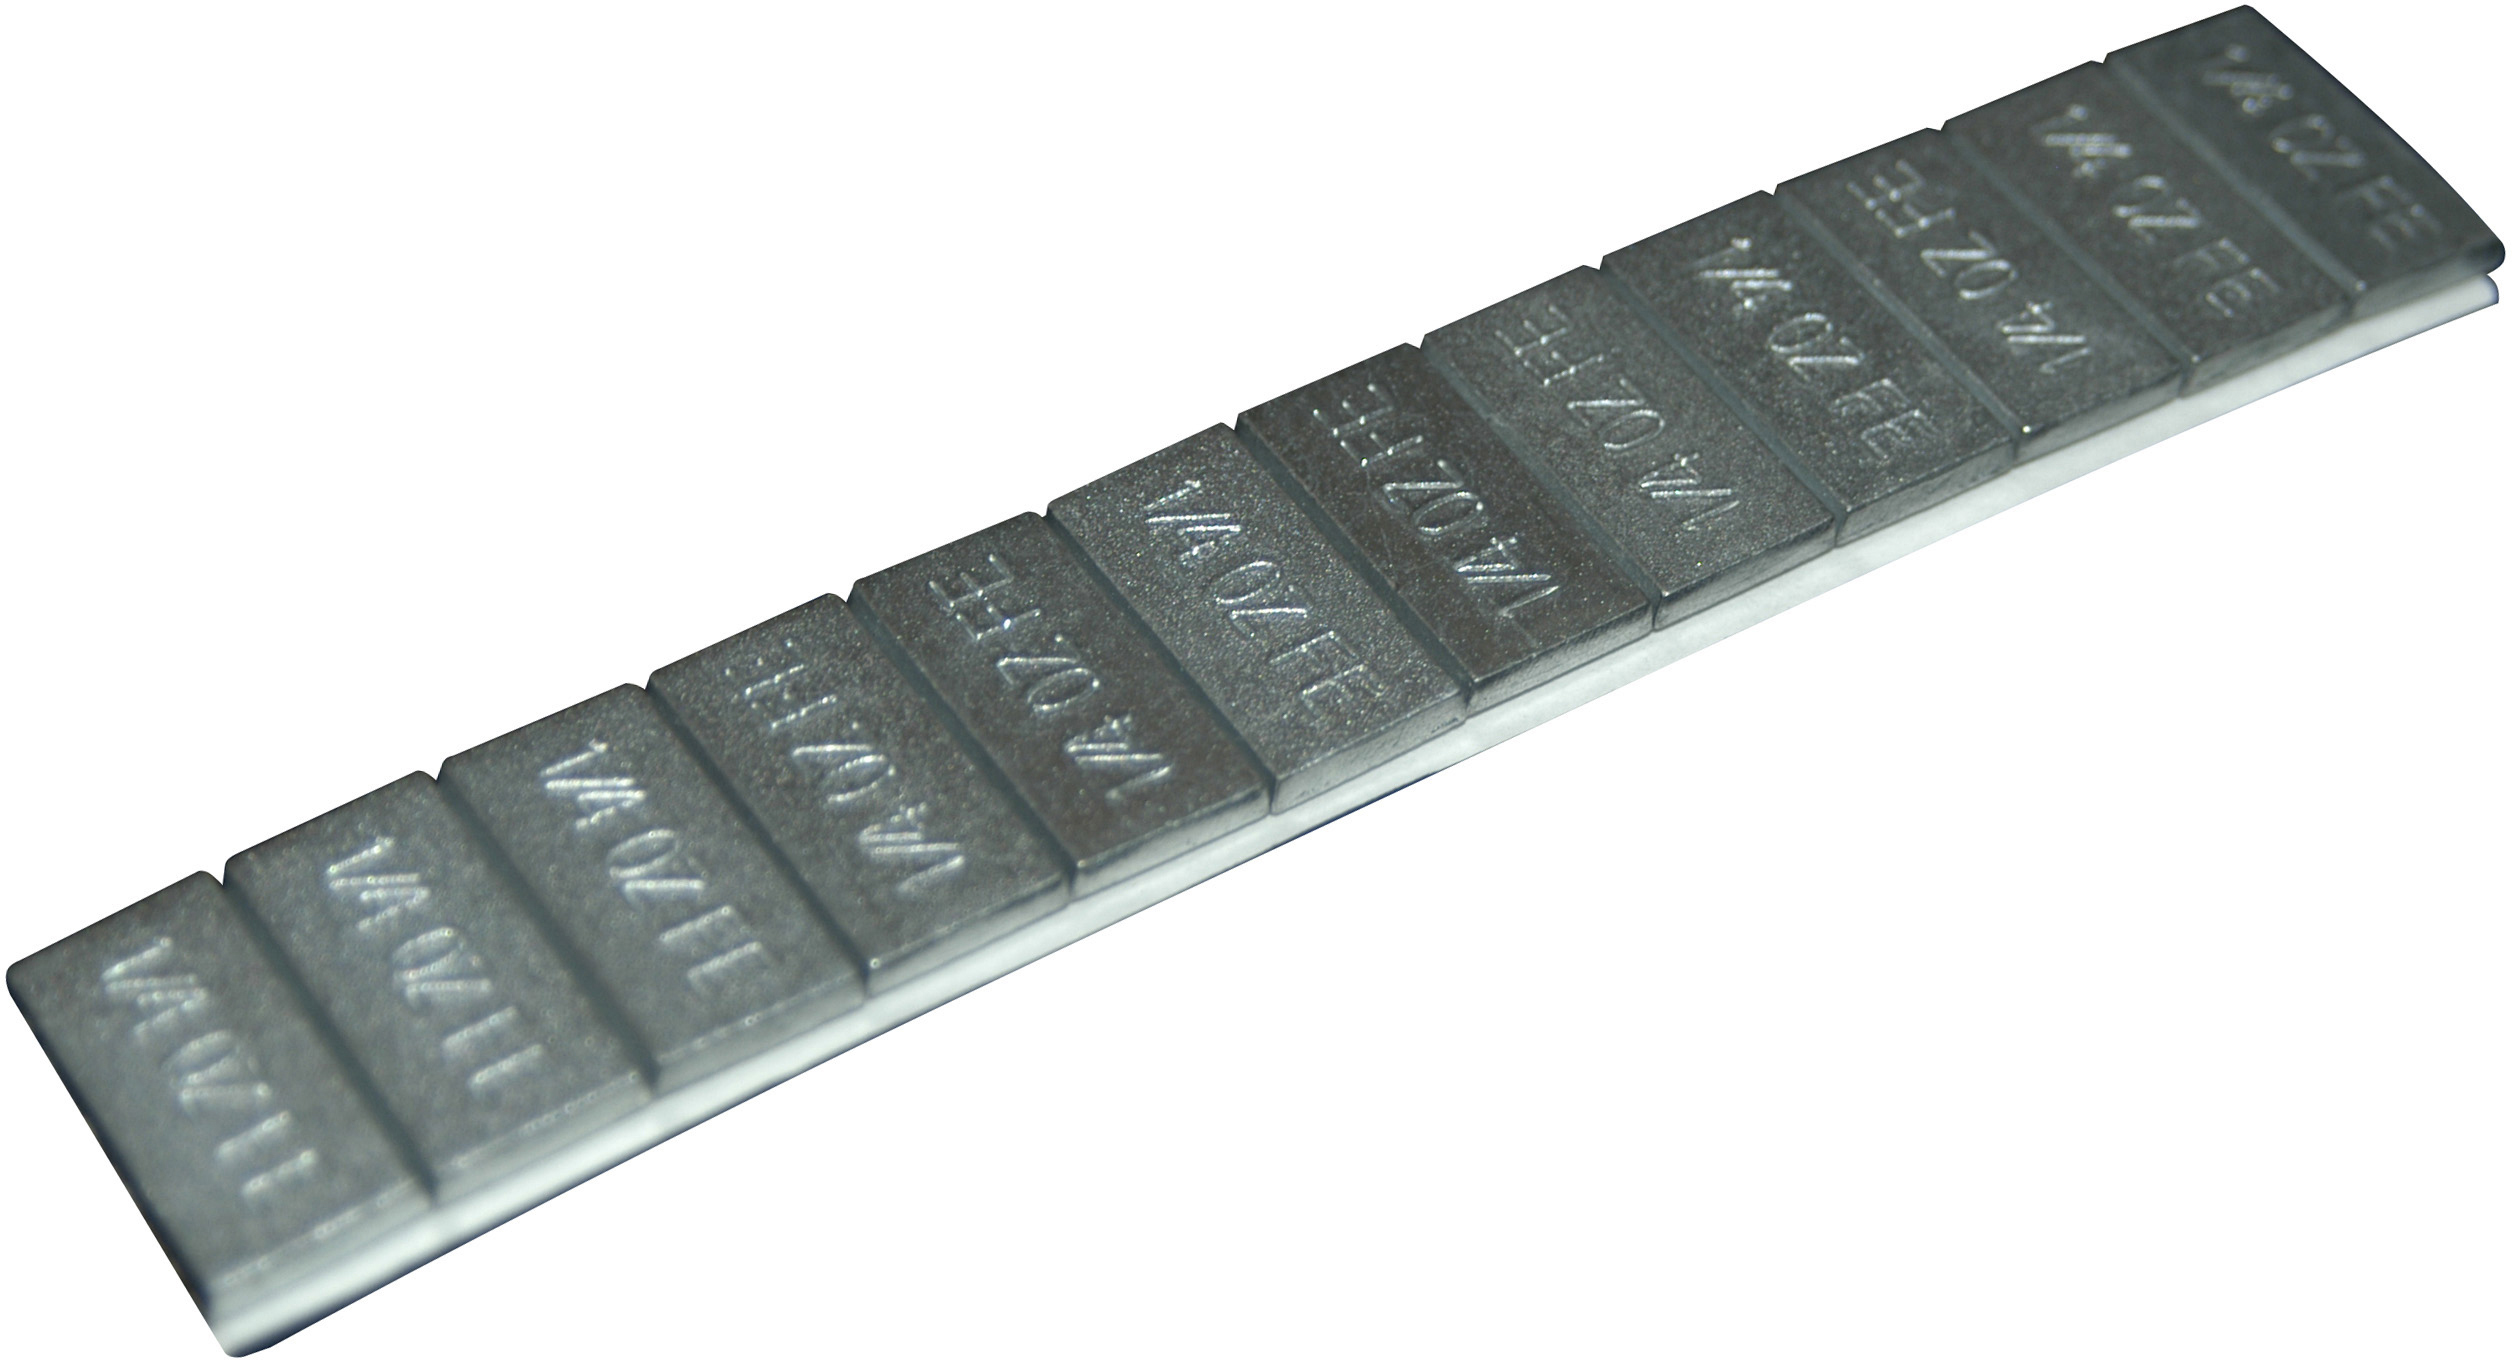 Zinc Coated Adhesive Wheel weight .25oz 48 strip